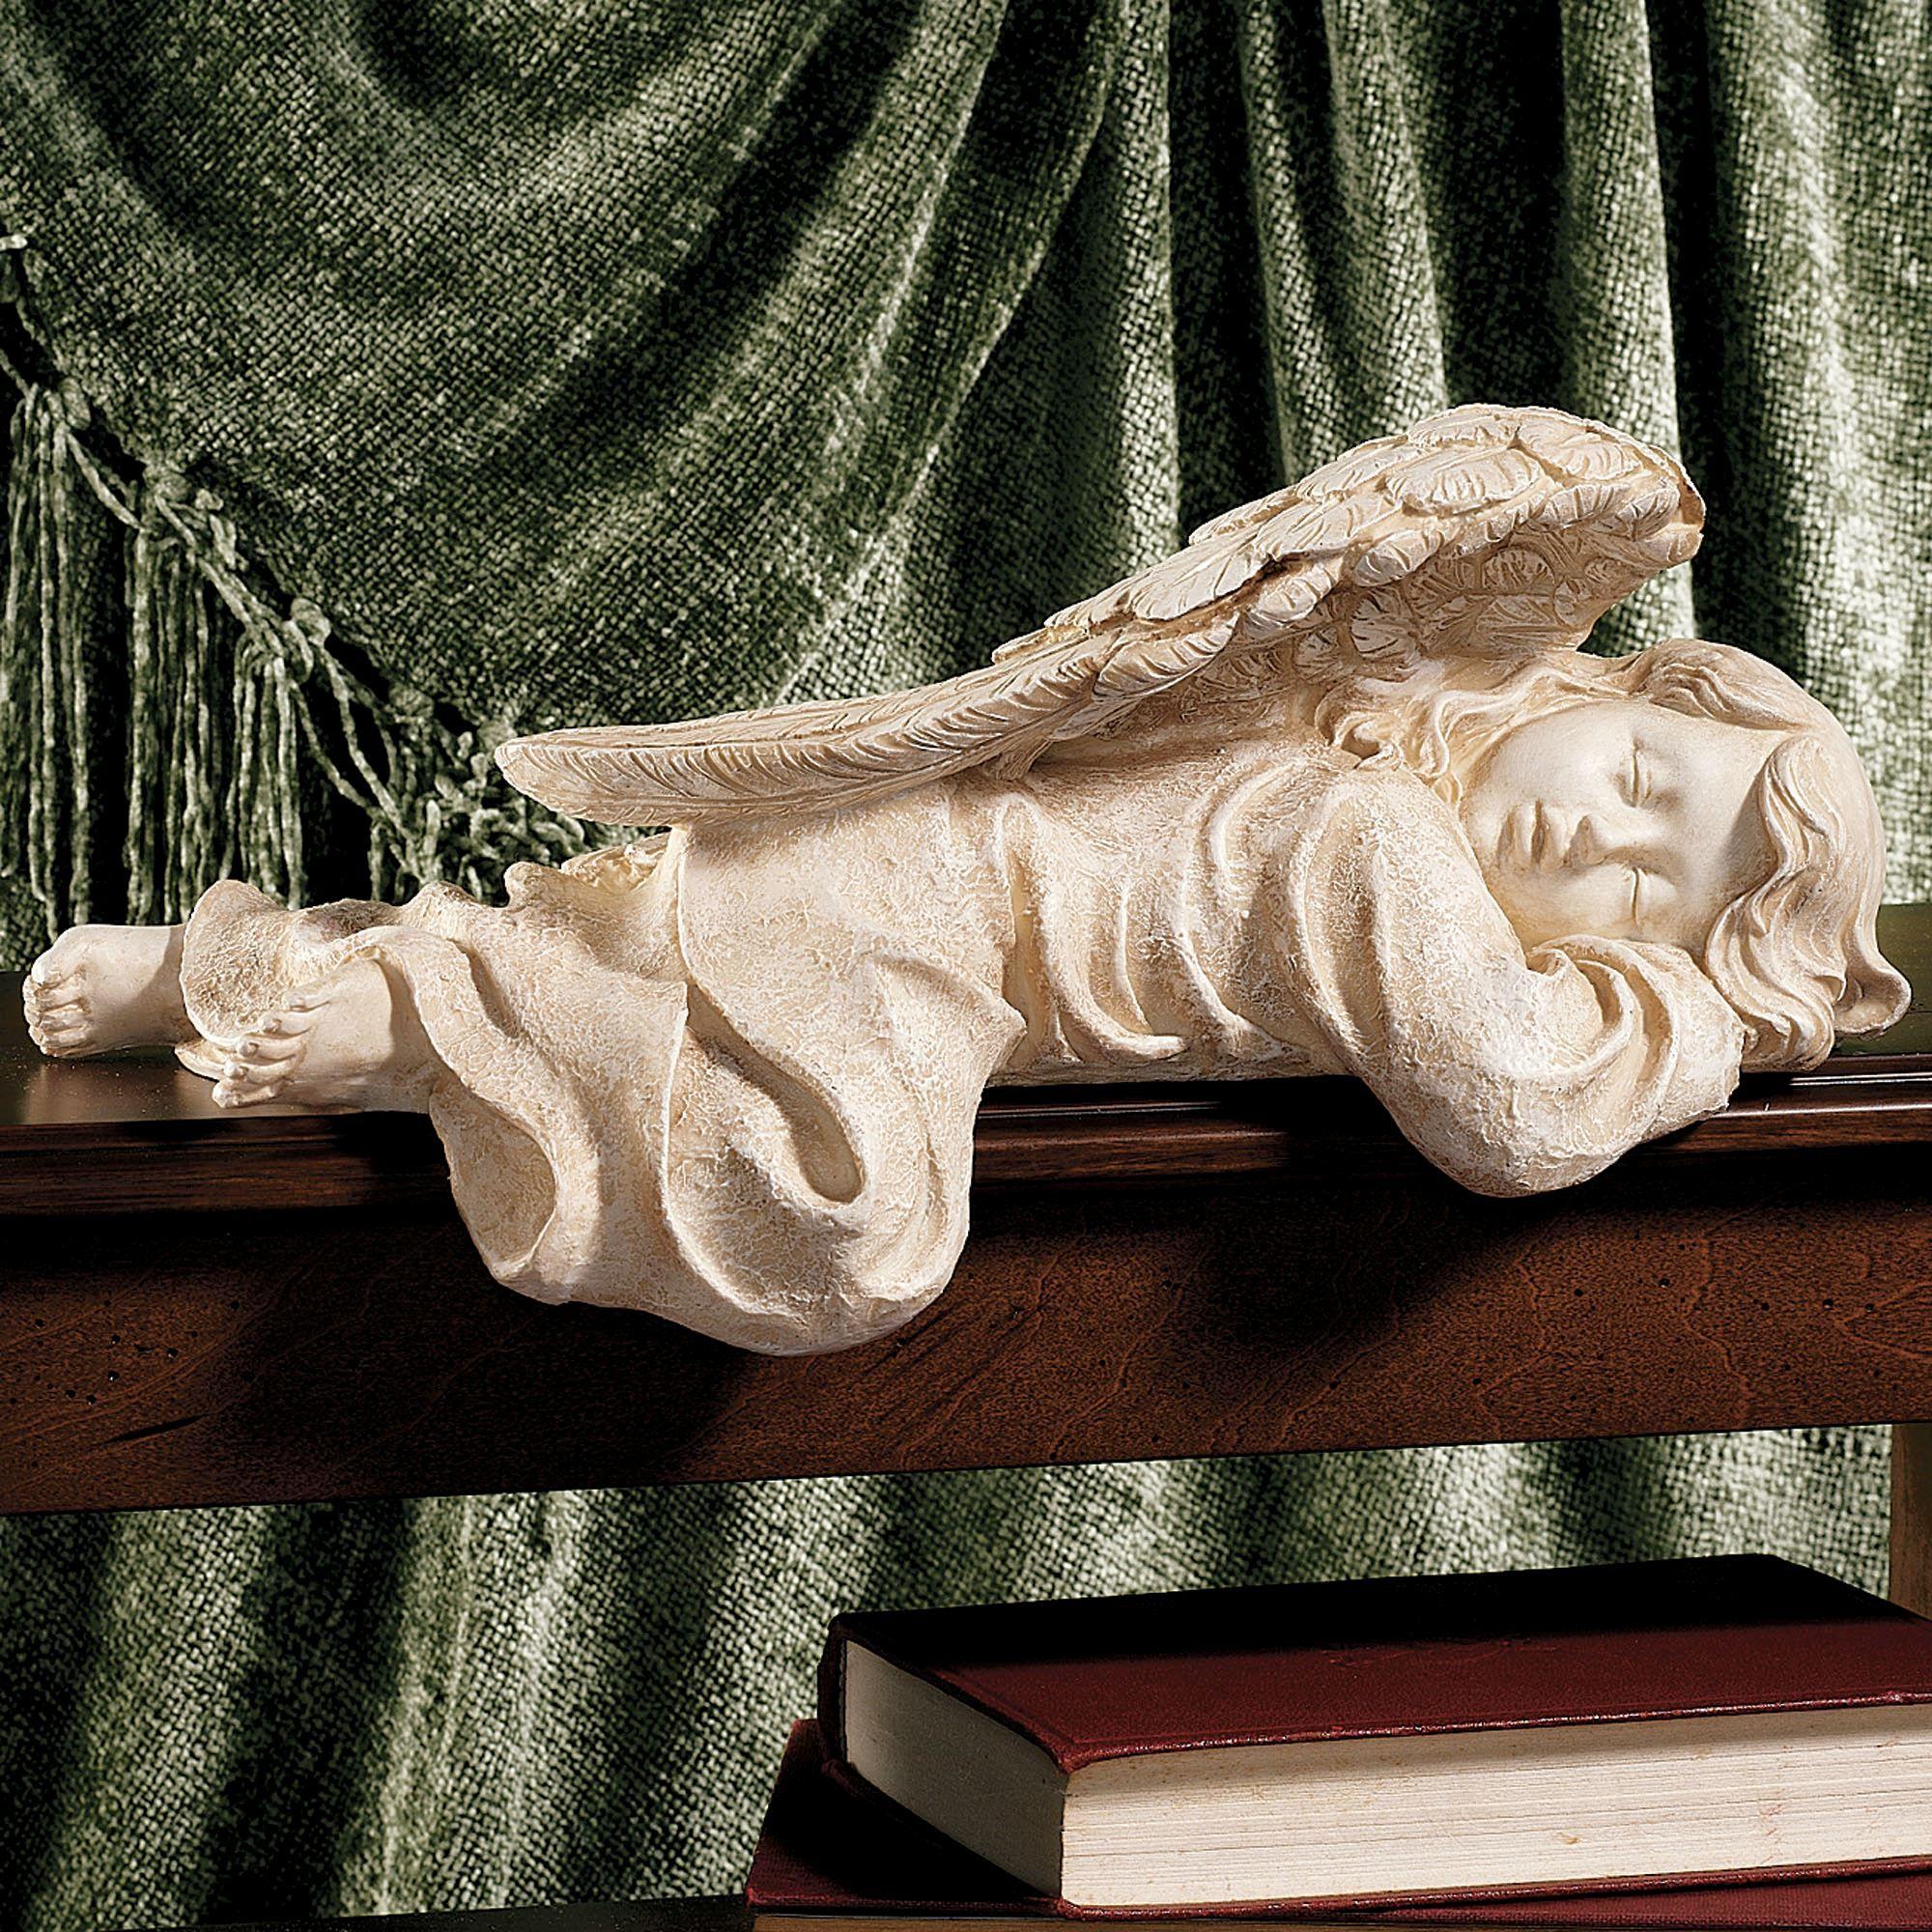 Cute Beautiful Mermaid Resin Figurine Ornament 3D Sleeping Beauty Statue